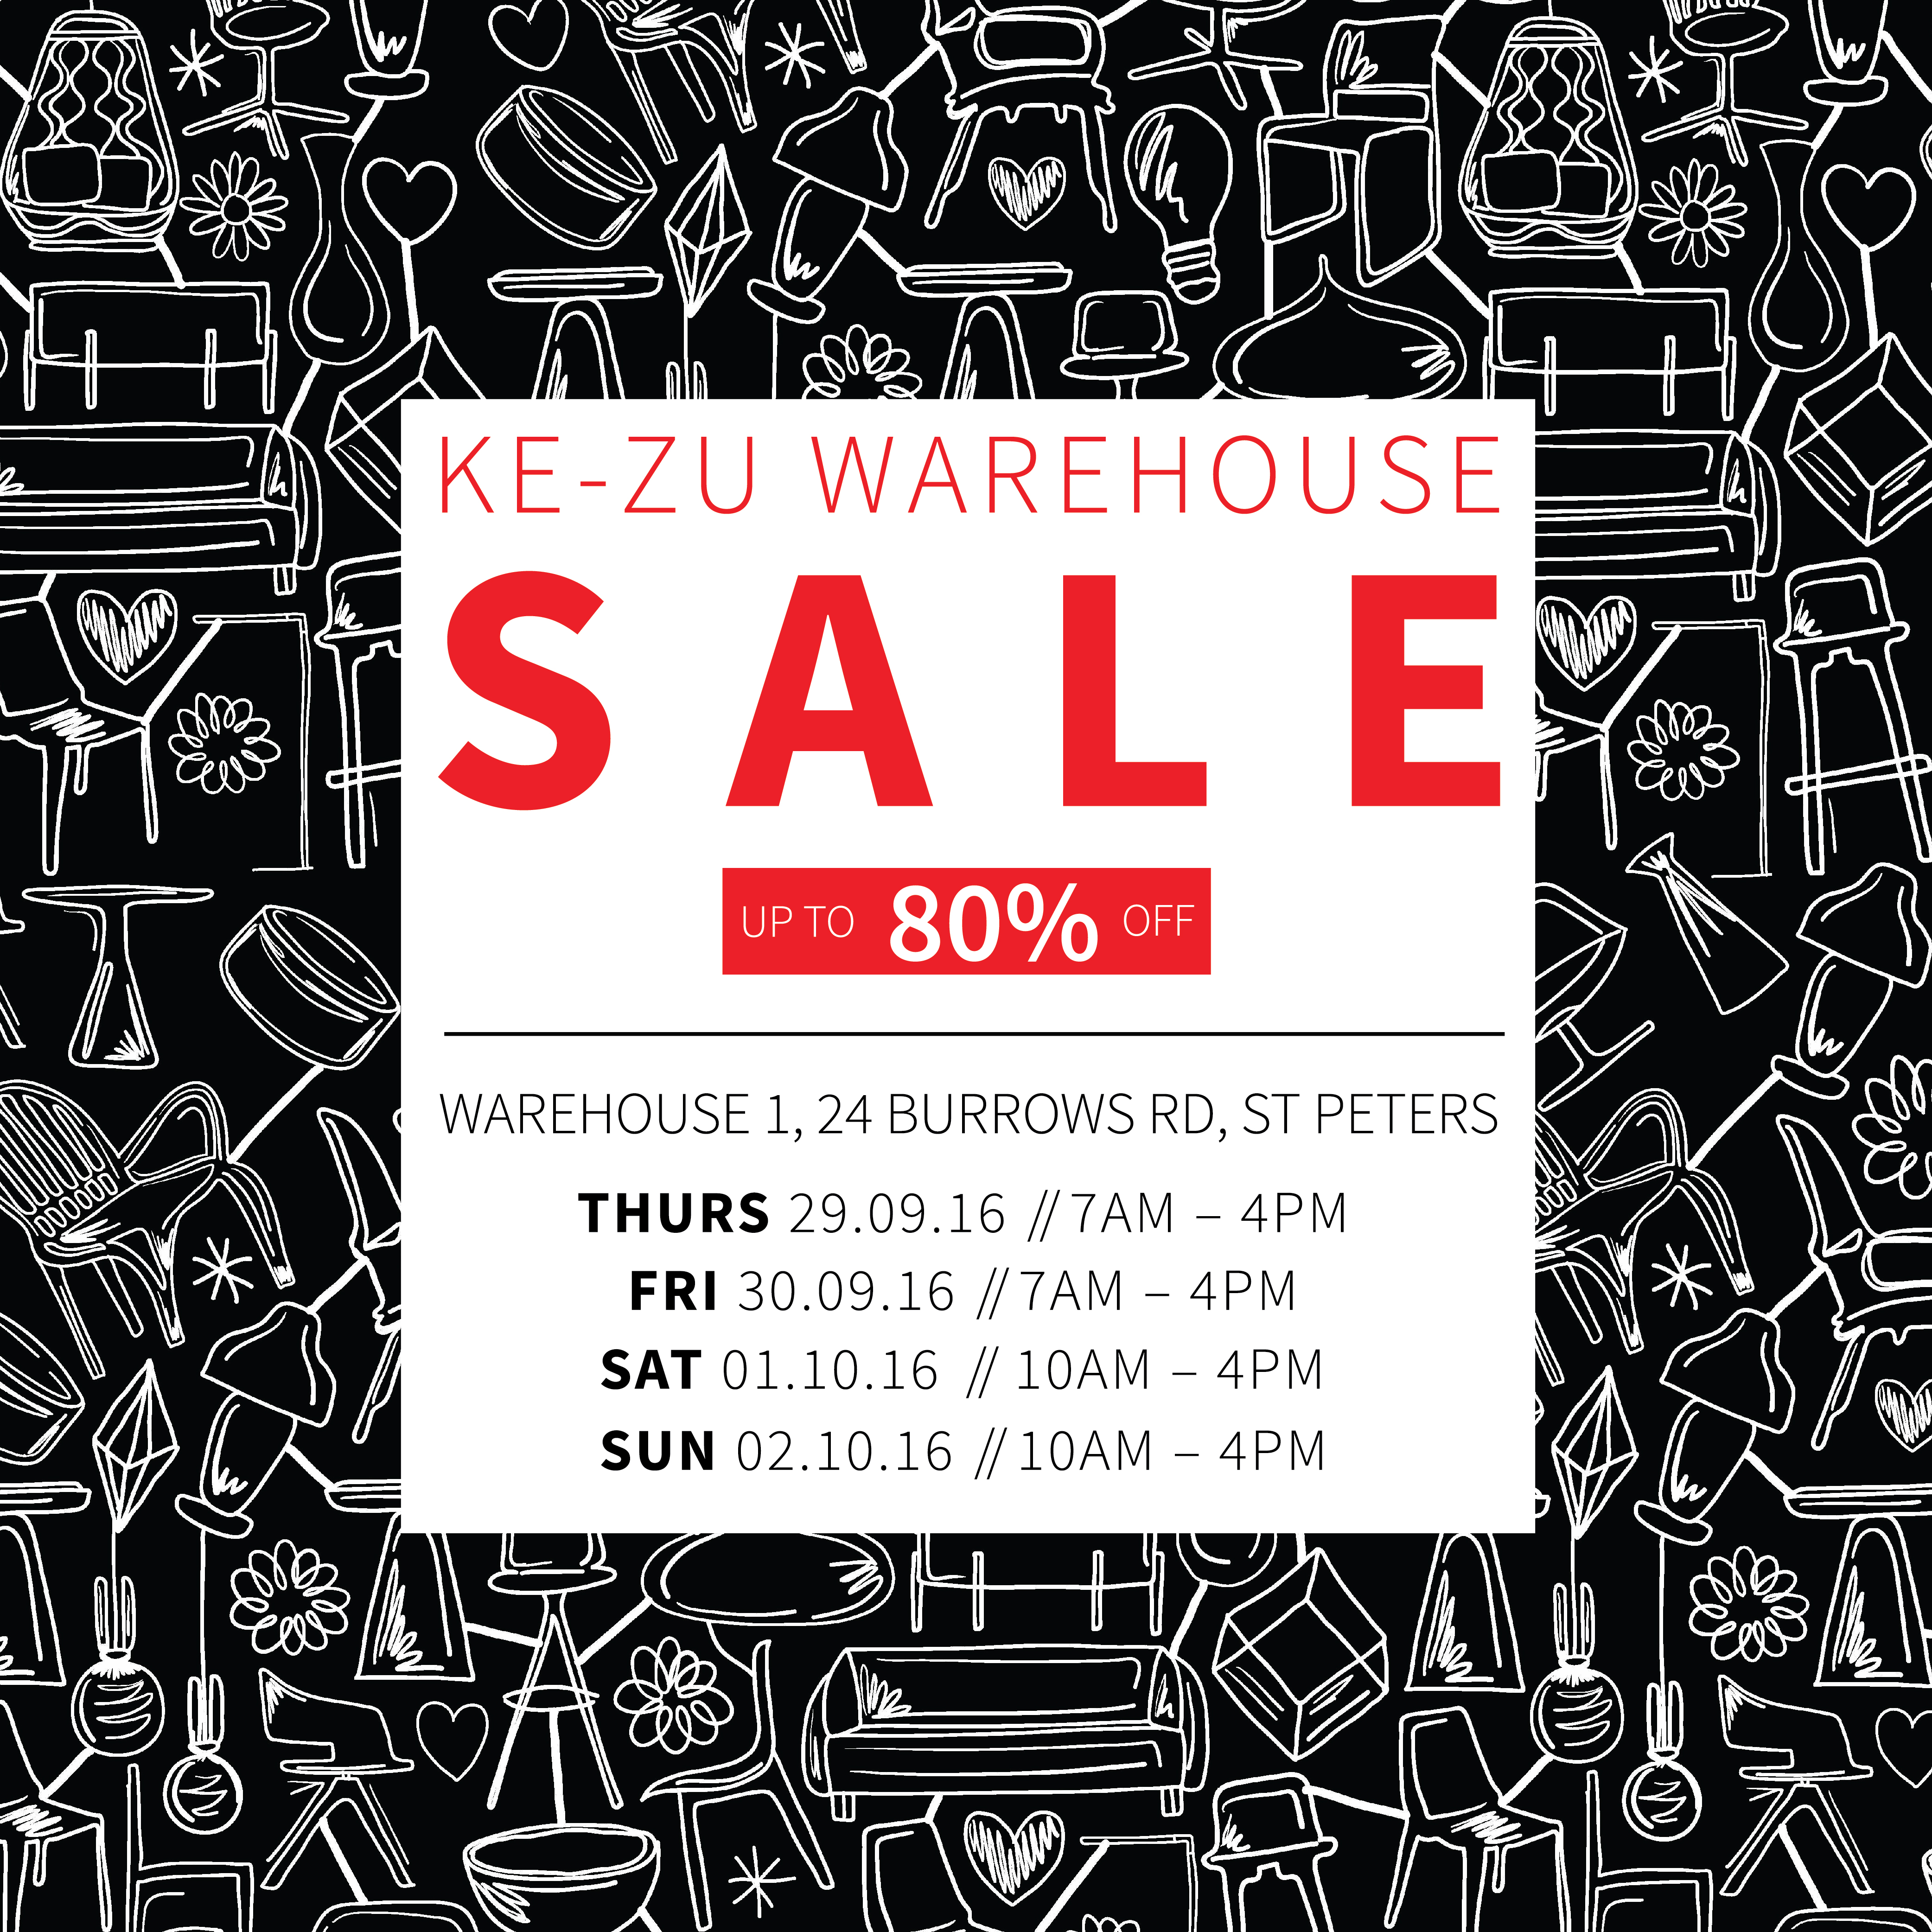 The KE-ZU Warehouse Sale is Coming!